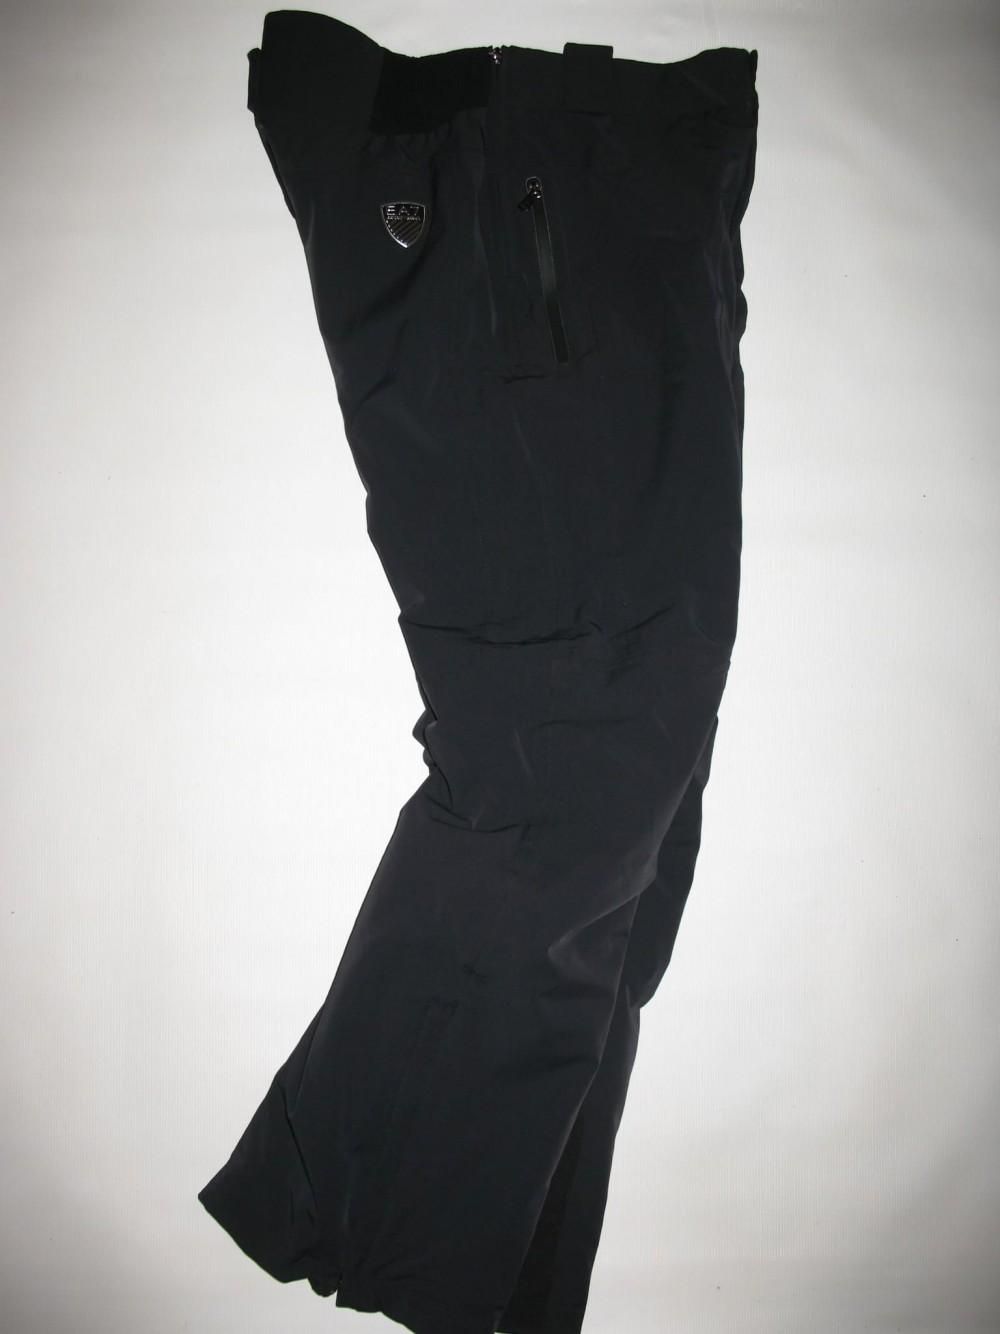 Штаны EA7 emporio armani ski bib pants ( размер XL) - 10